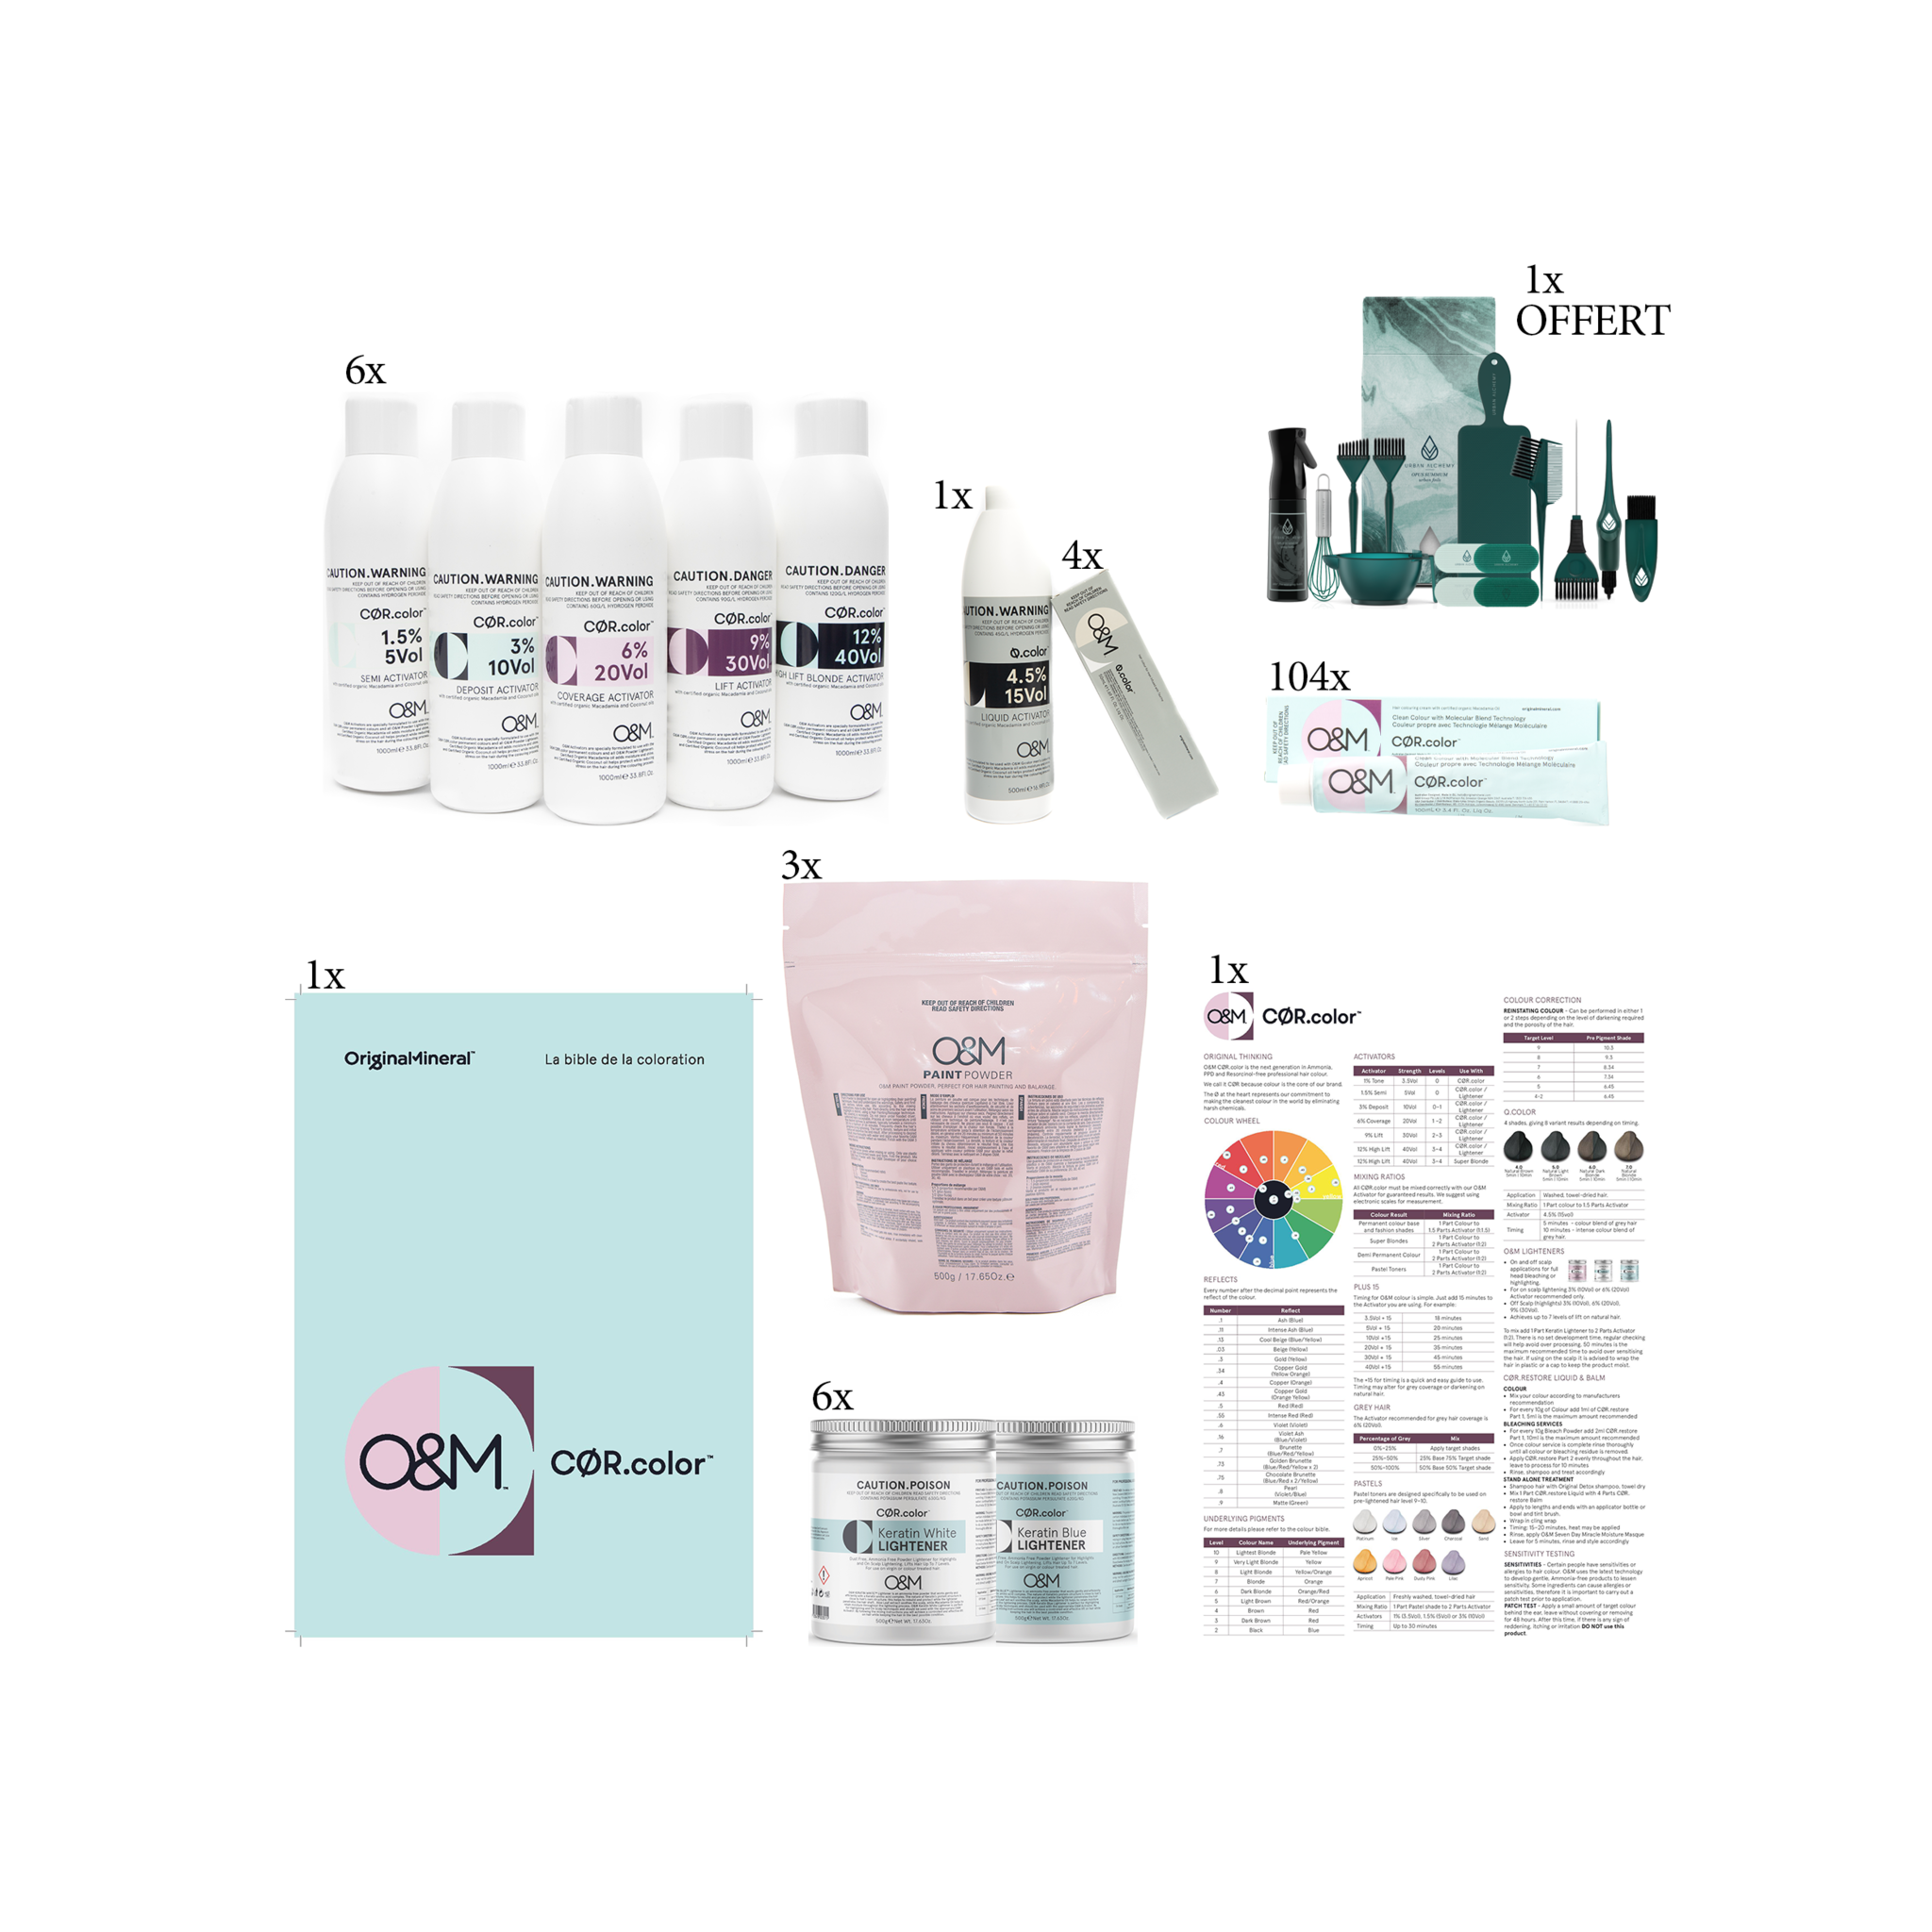 O&M - Original Mineral O&M - CØR.color Starter Set